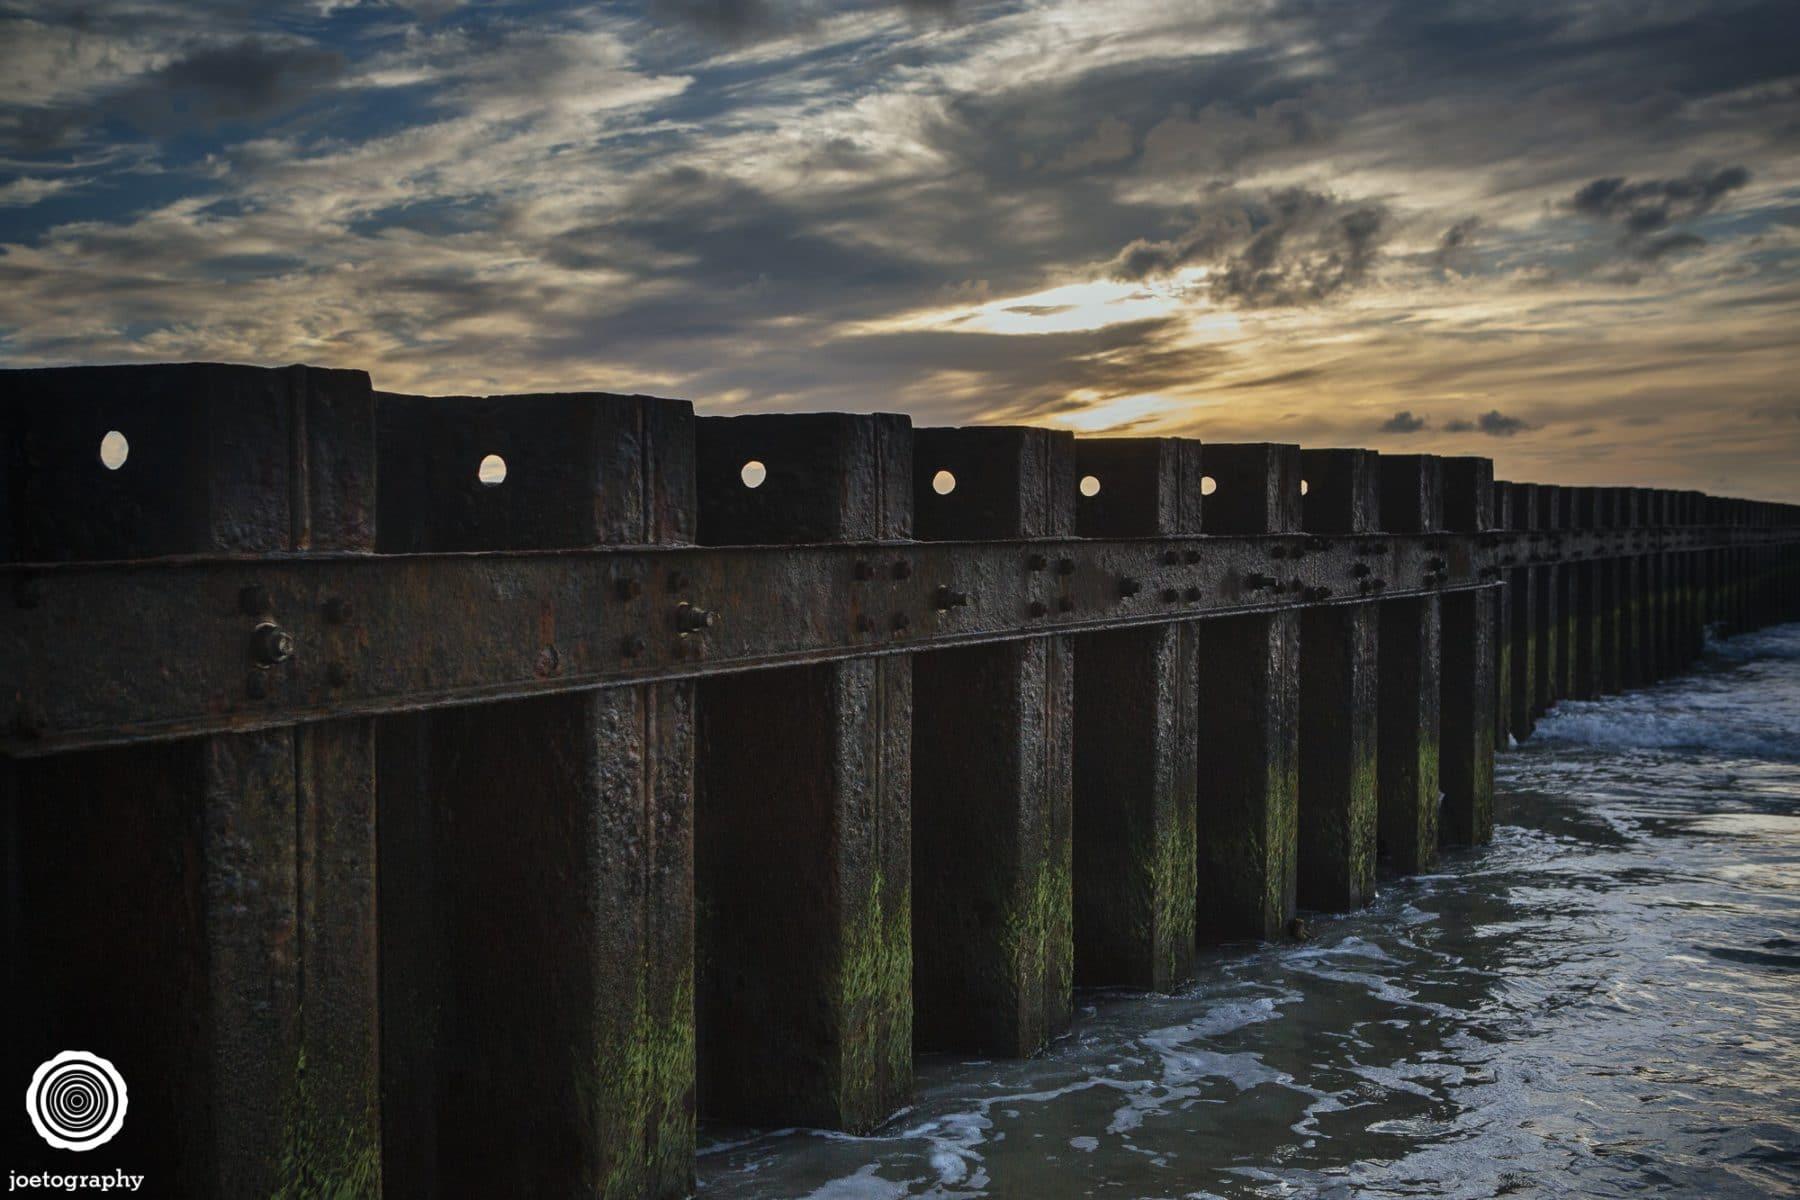 Outer-Banks-North-Carolina-Travel-Photography-42